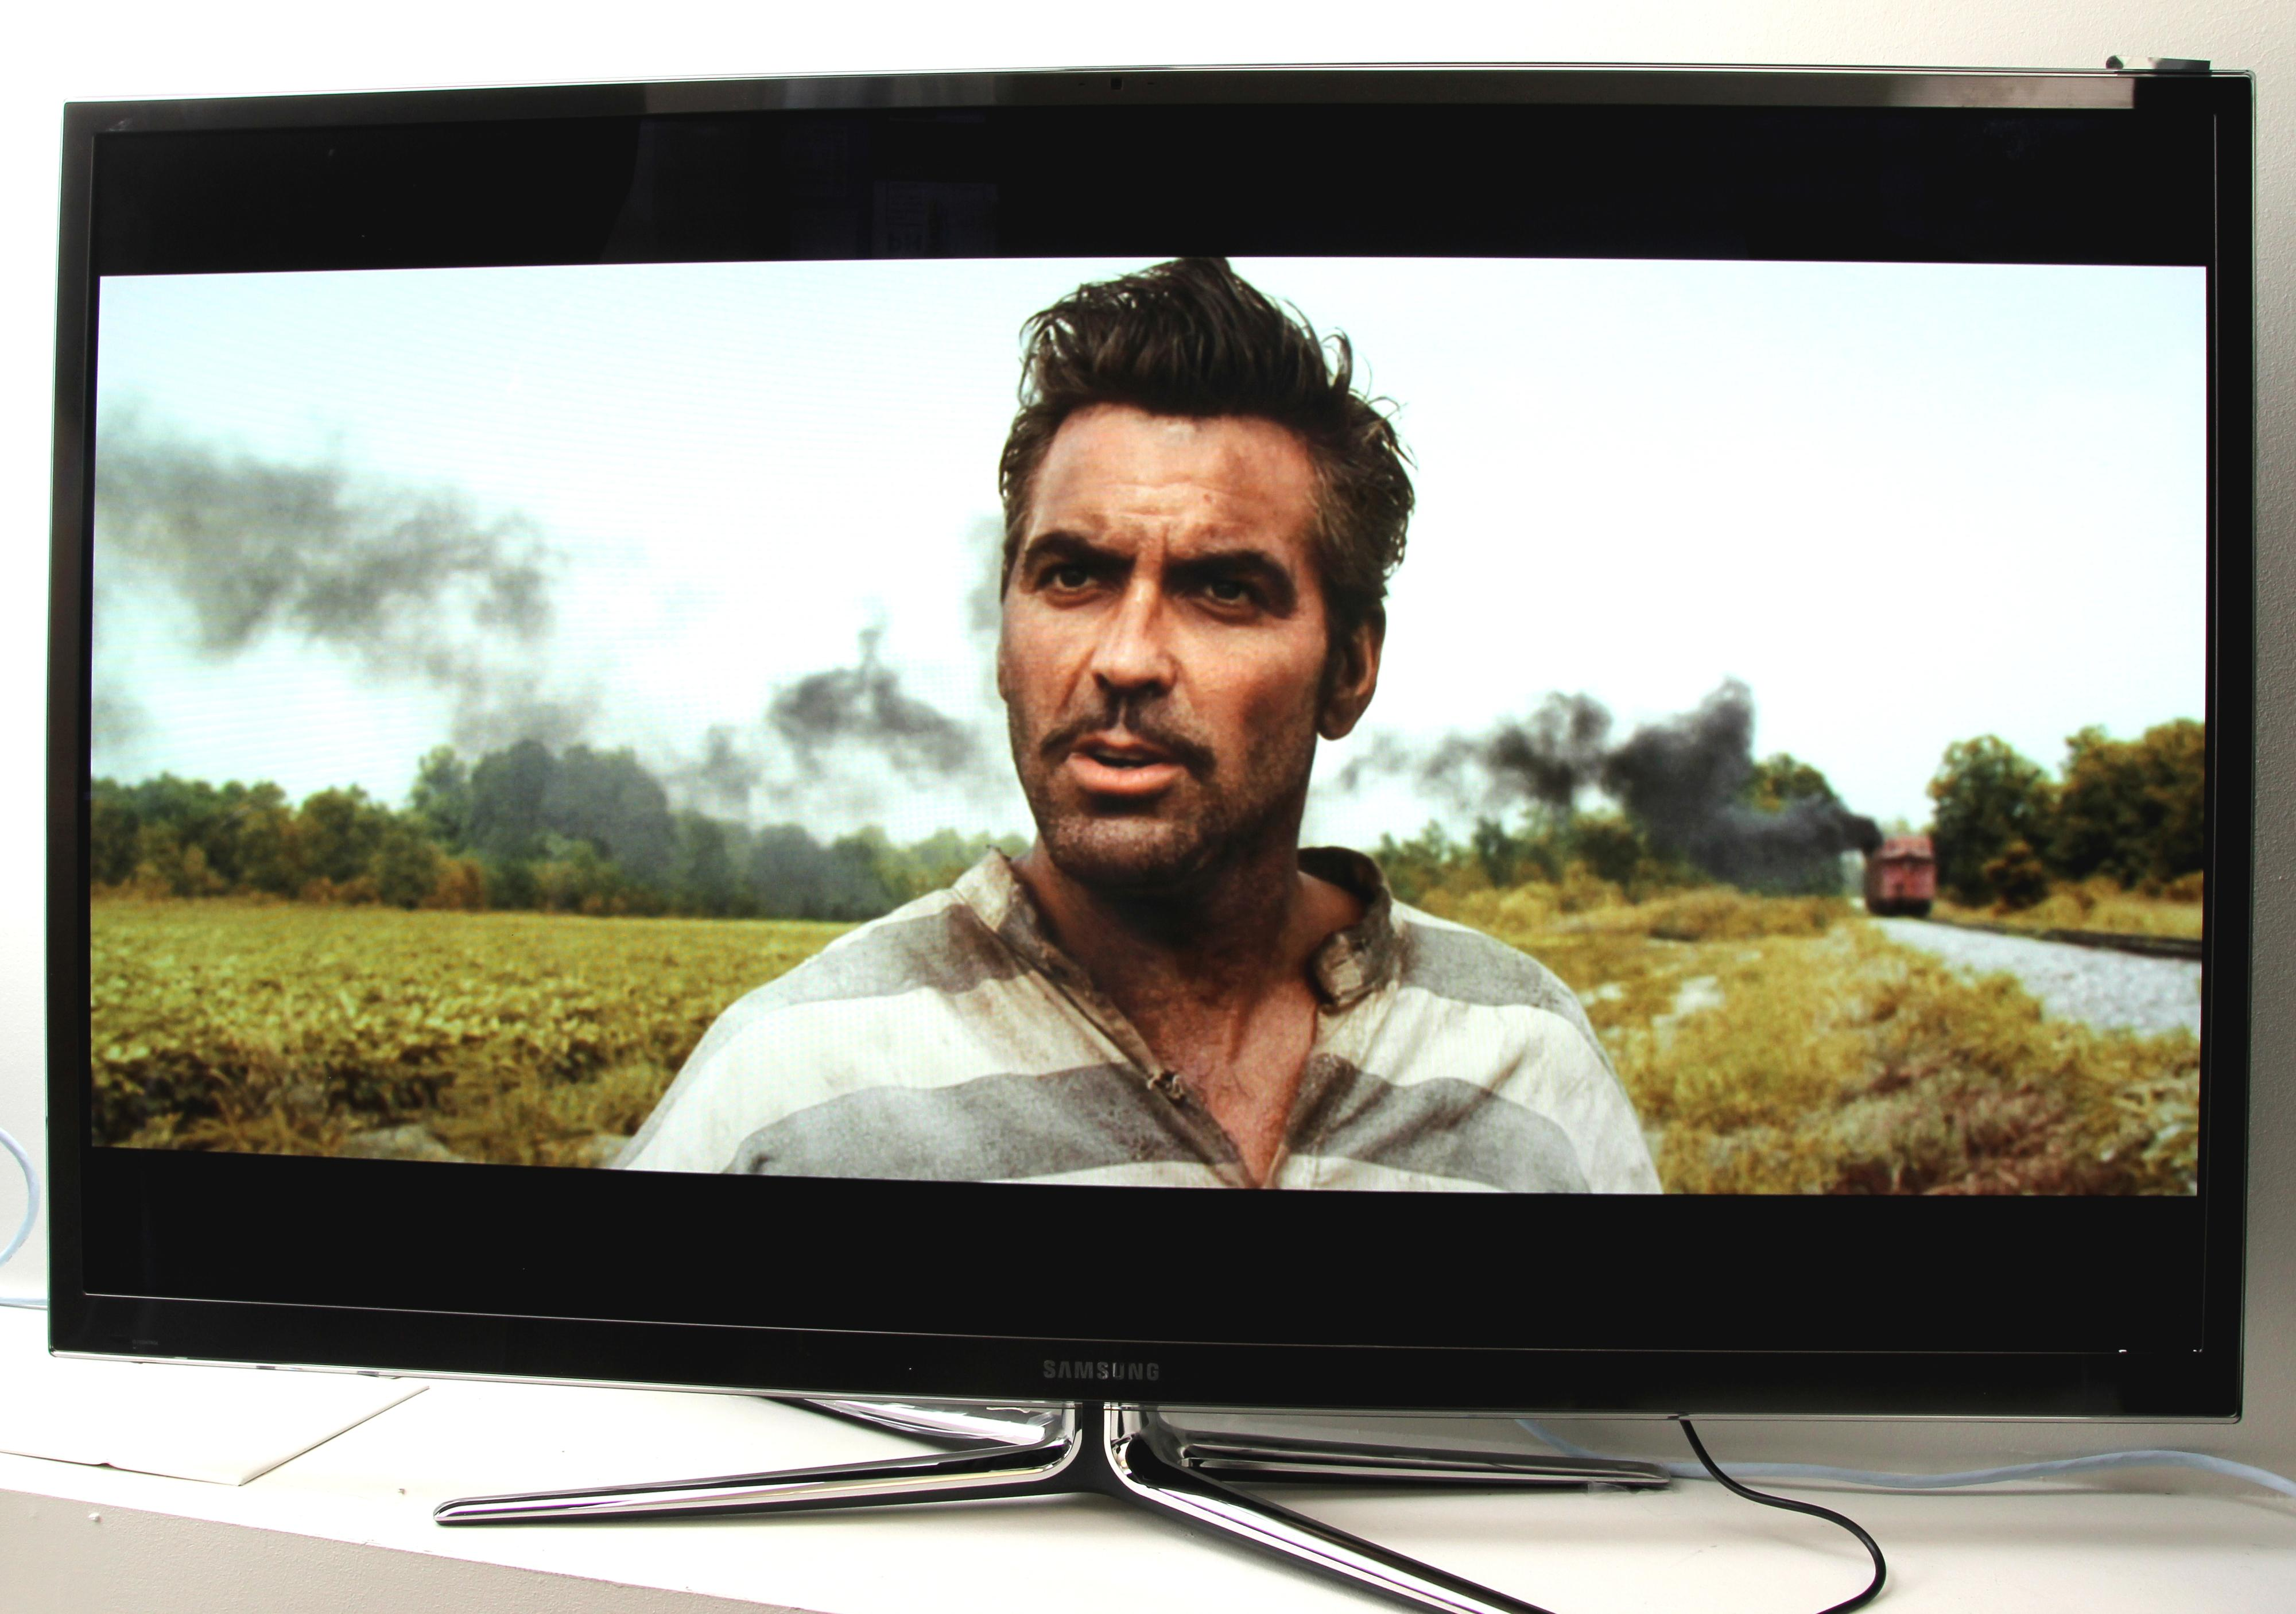 Samsung PS64E8005 har et kamera på toppen av TV-en.Foto: Hardware.no